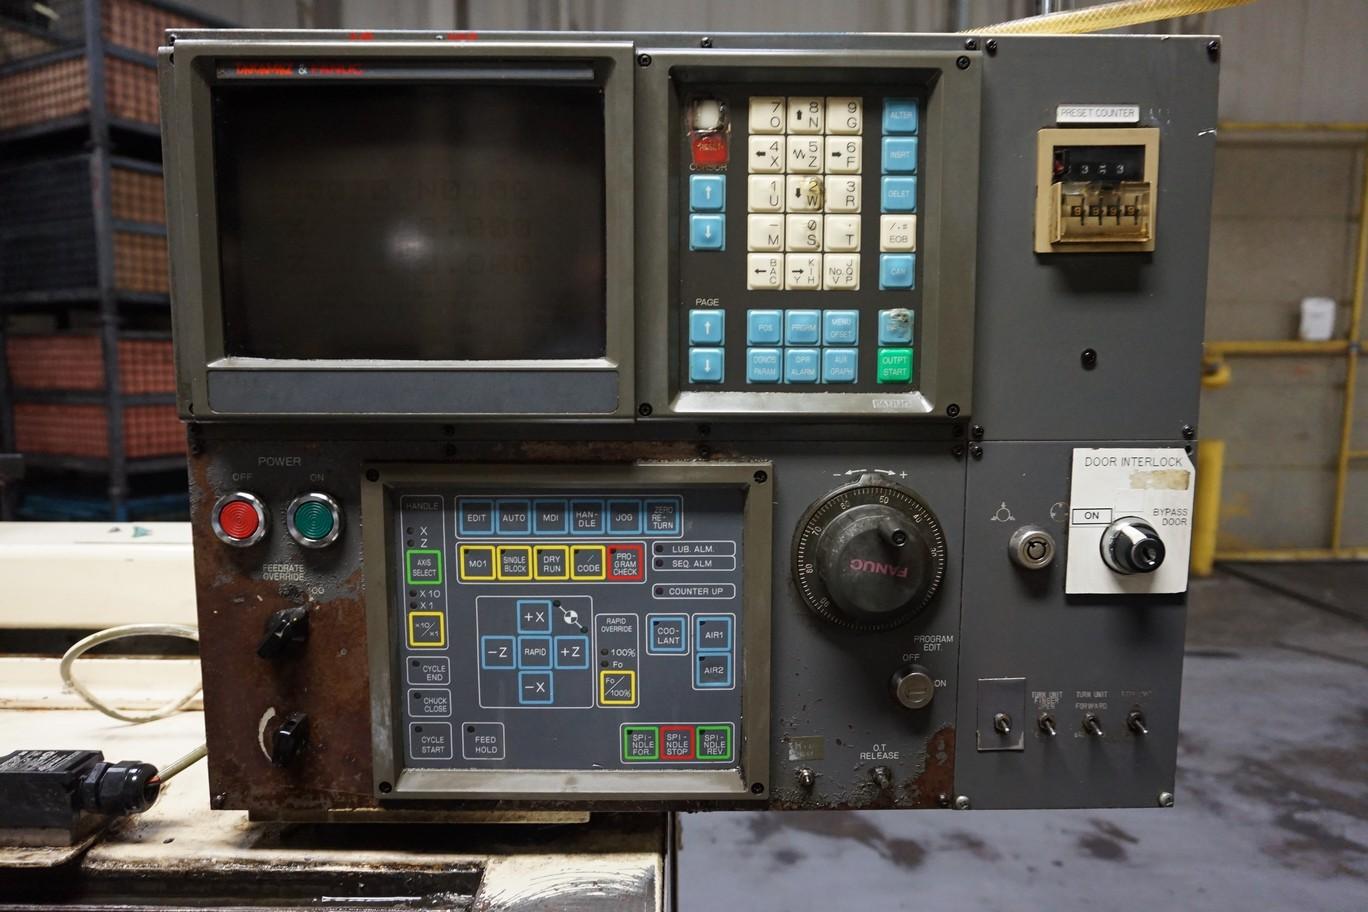 Takamatsu Model MT CNC Lathe 200/220V c/w Transformer (L66) - Image 3 of 7